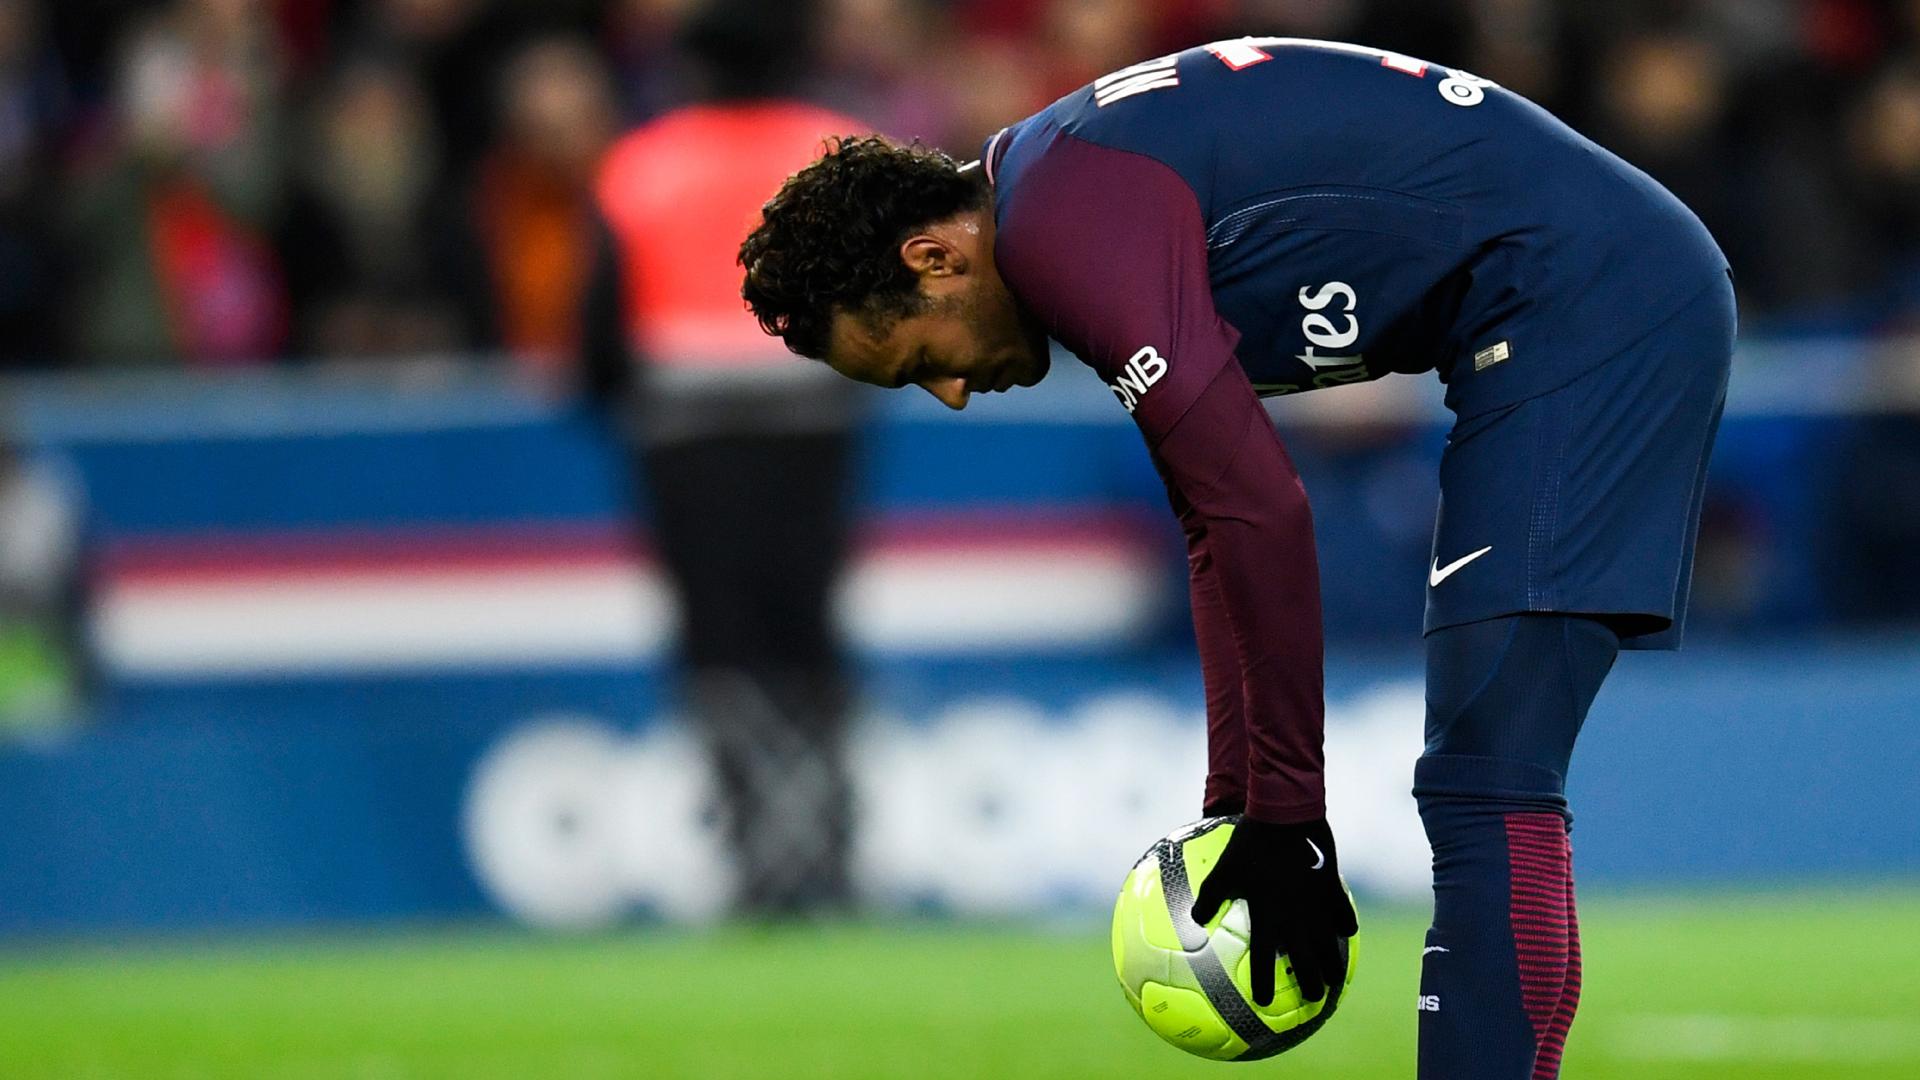 Neymar PSG Dijon Ligue 1 01172018